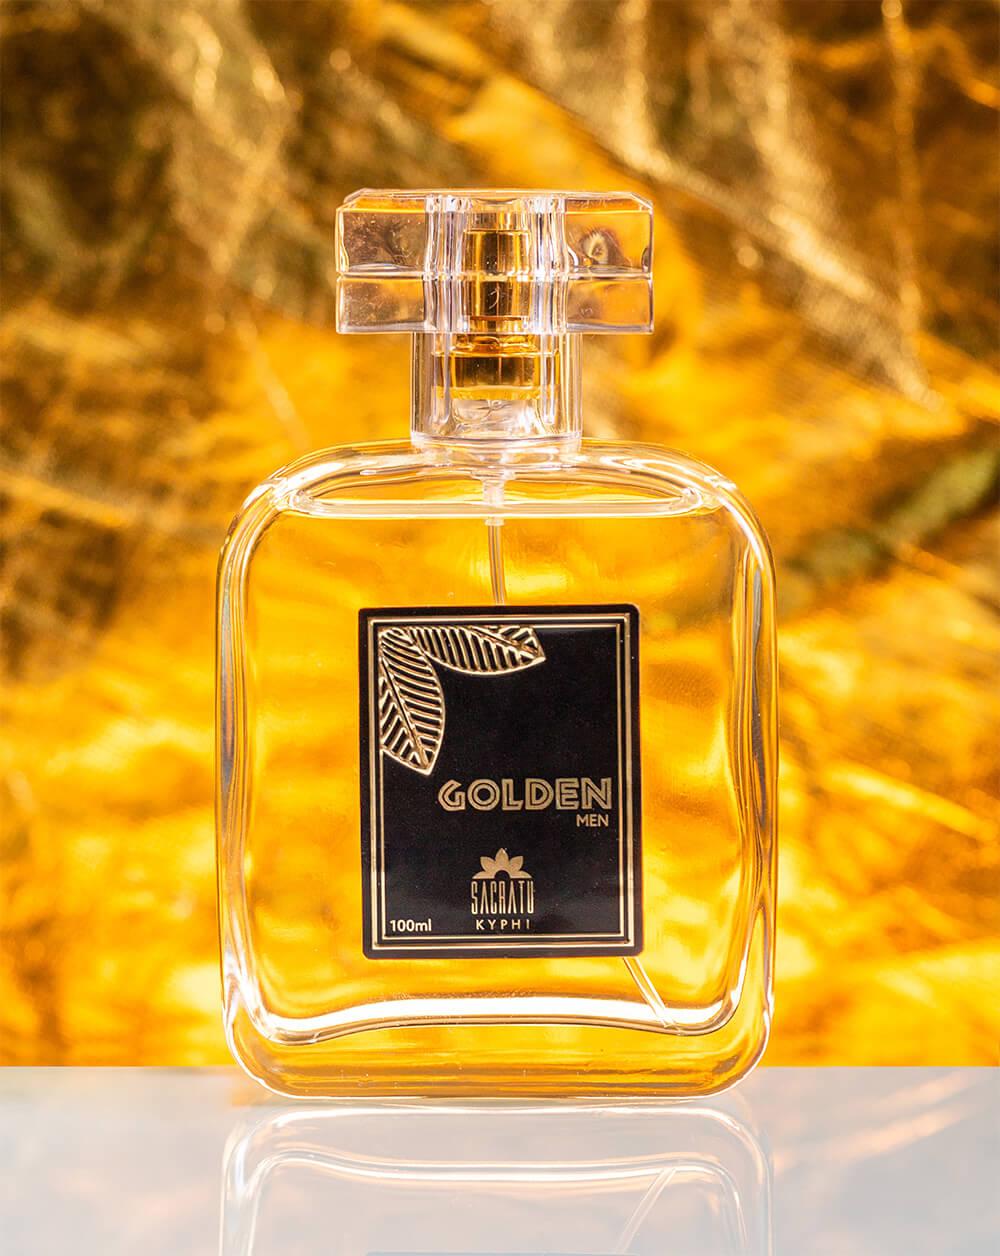 GOLDEN Inspirado em One Million by Paco Rabanne